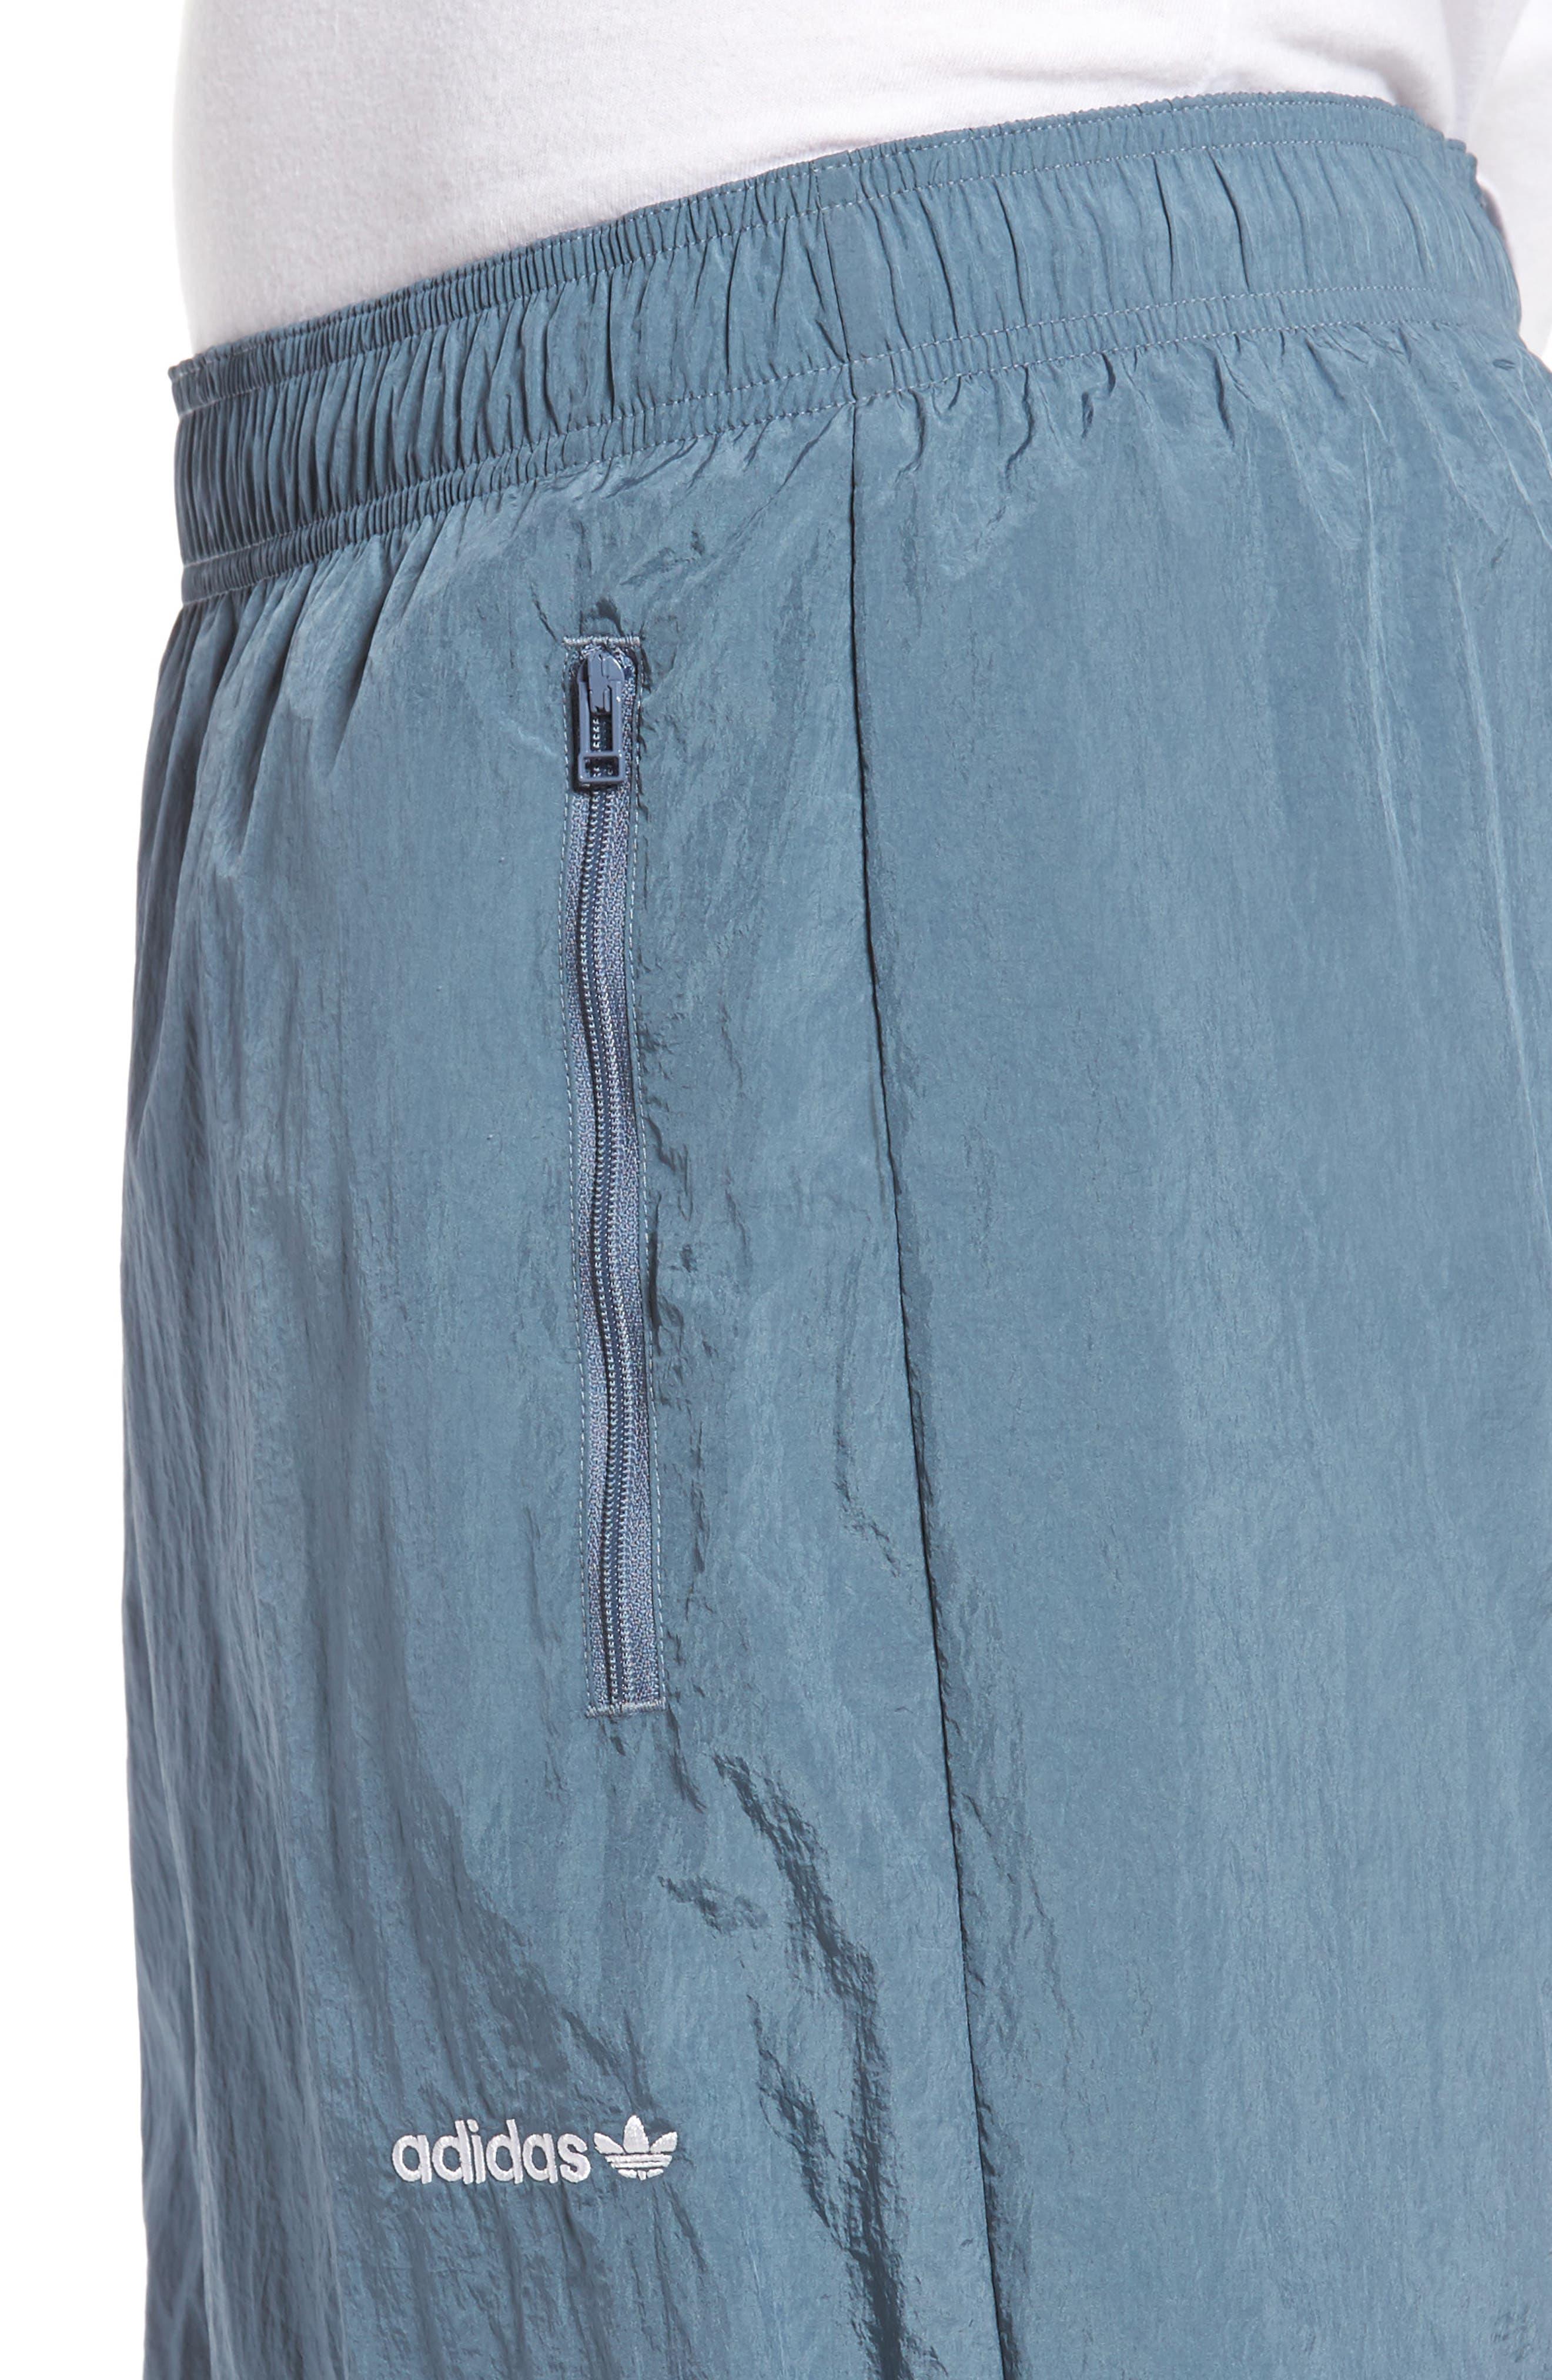 Originals V-Stripe Windpants,                             Alternate thumbnail 4, color,                             Raw Steel/ White